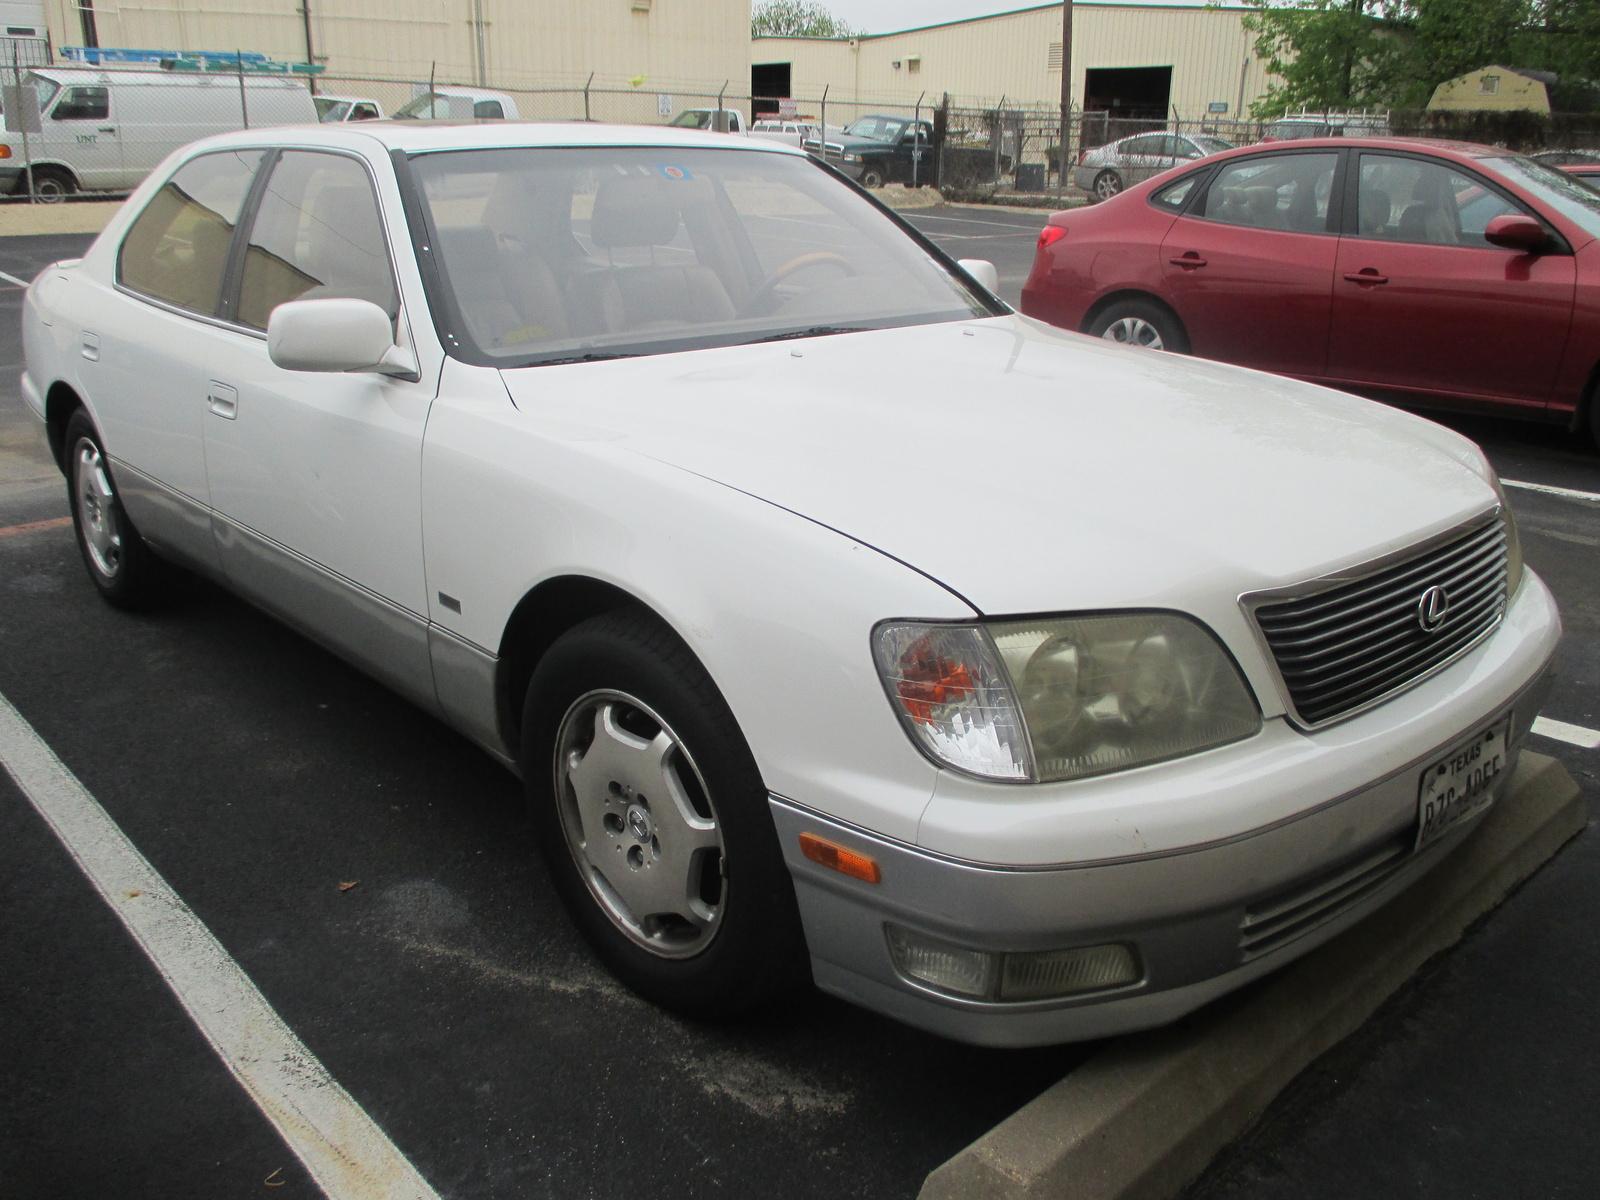 2000 Lexus LS 400 - Overview - CarGurus